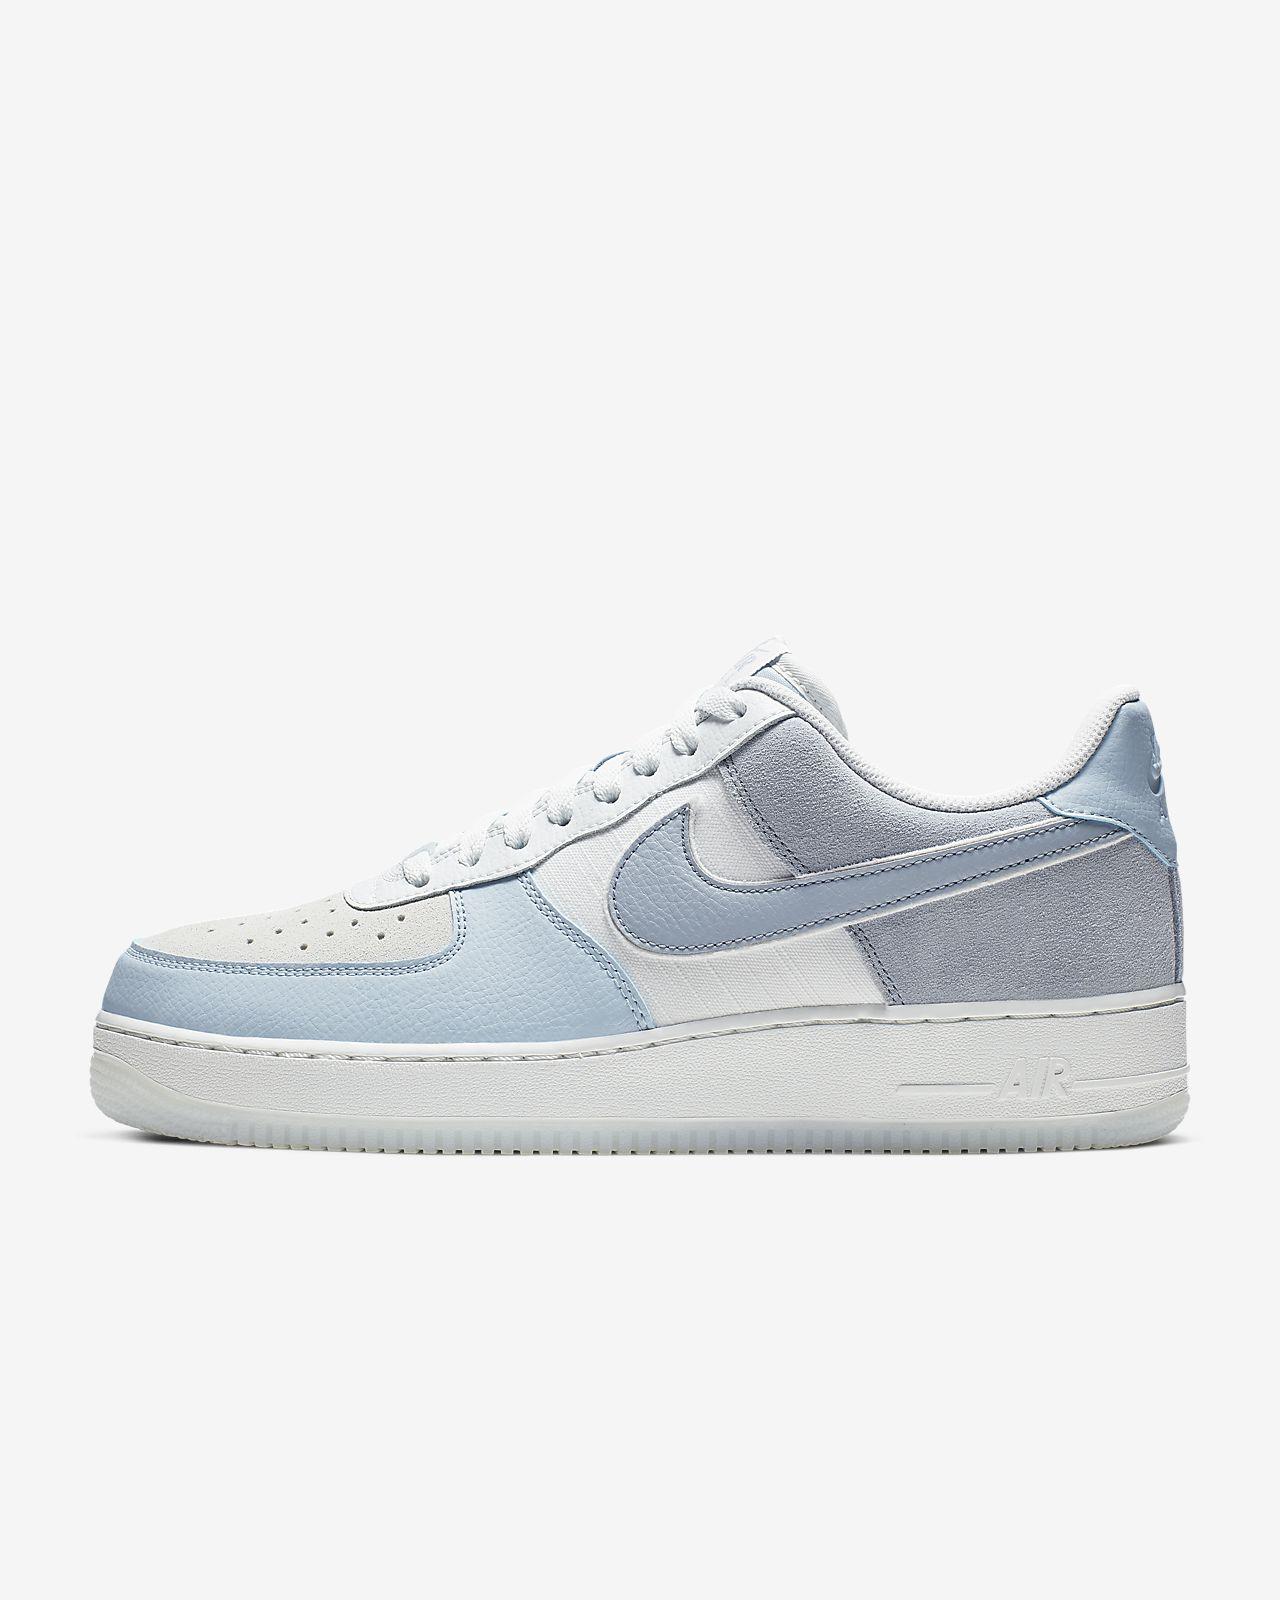 Nike Air Force 1 '07 LV8 2 Men's Shoe